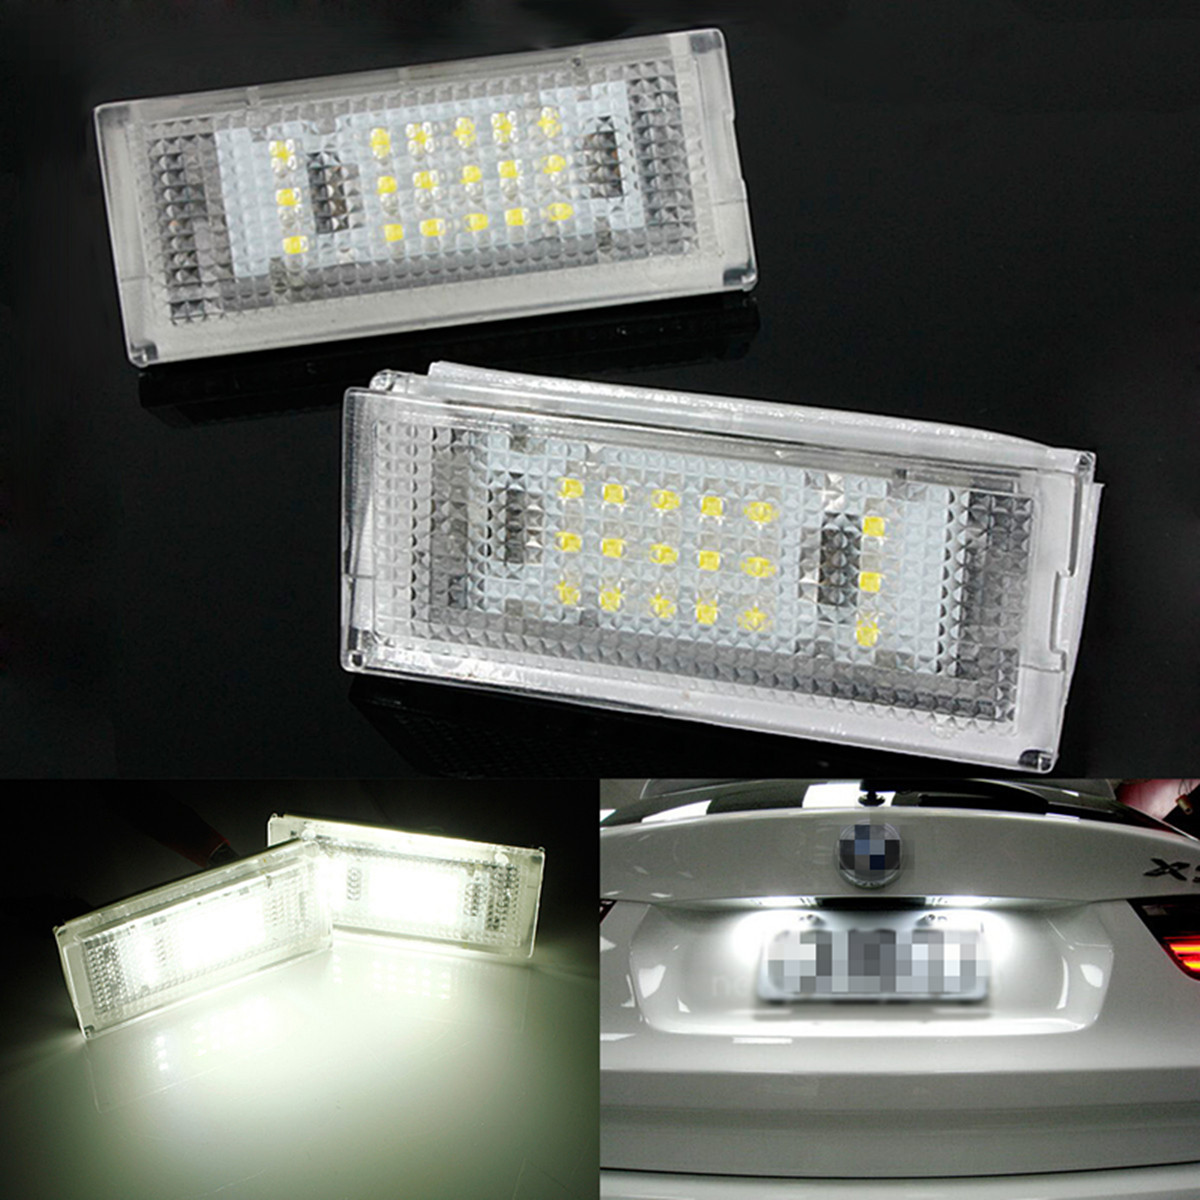 2Pcs 18 LED 6000K For HID License Plate Light Number Plate font b Lamp b font